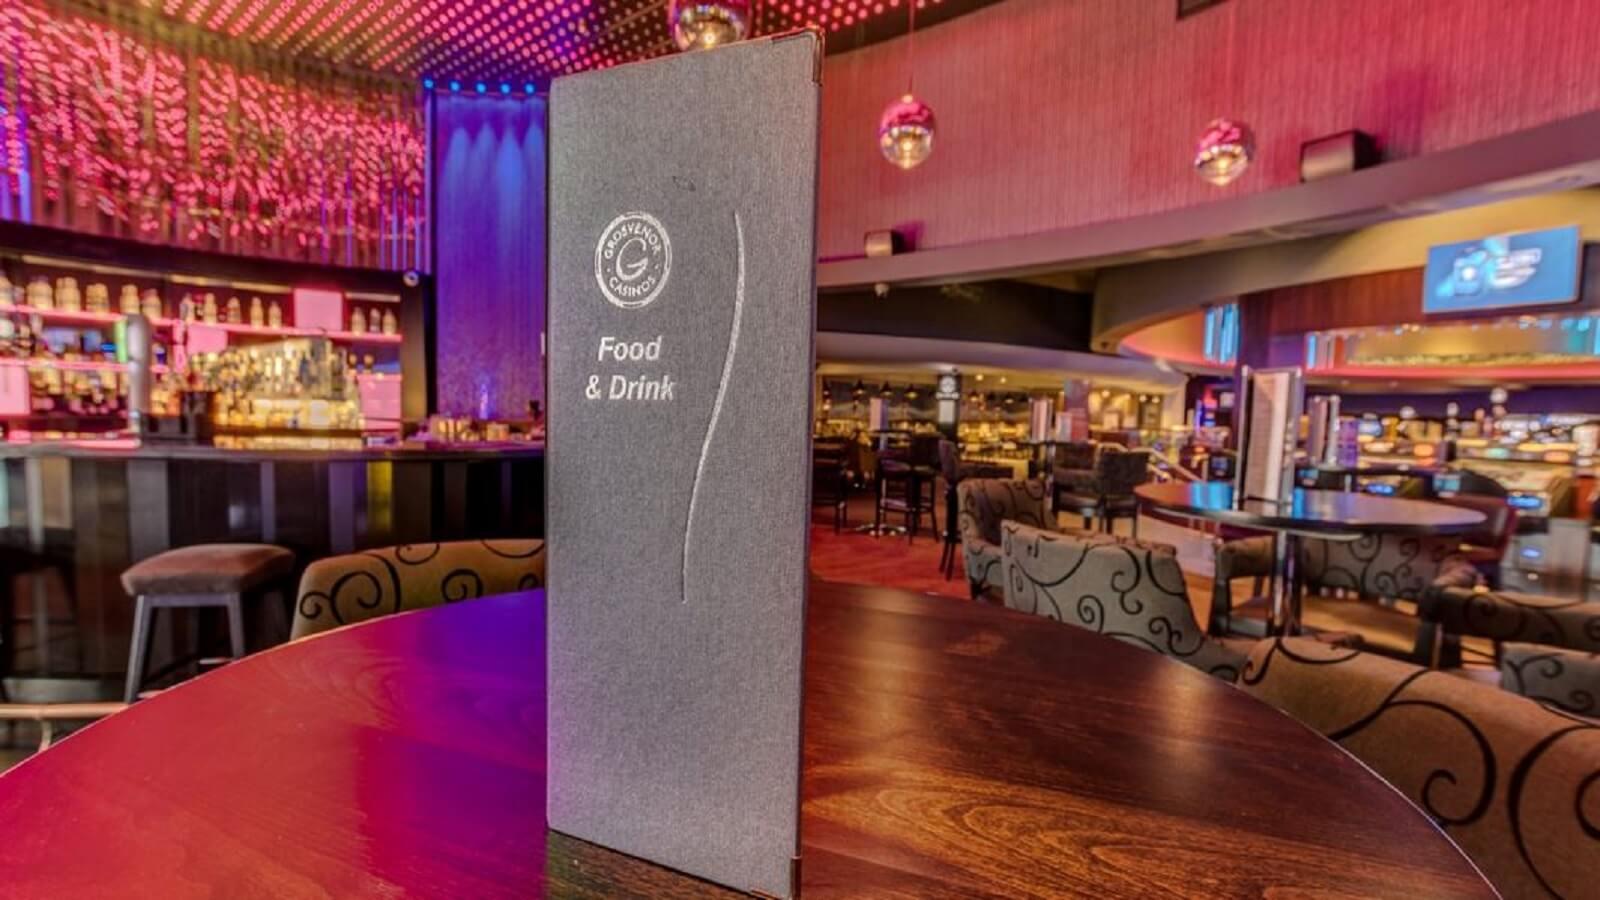 Grosvenor Casino Luton Restaurant & Bar